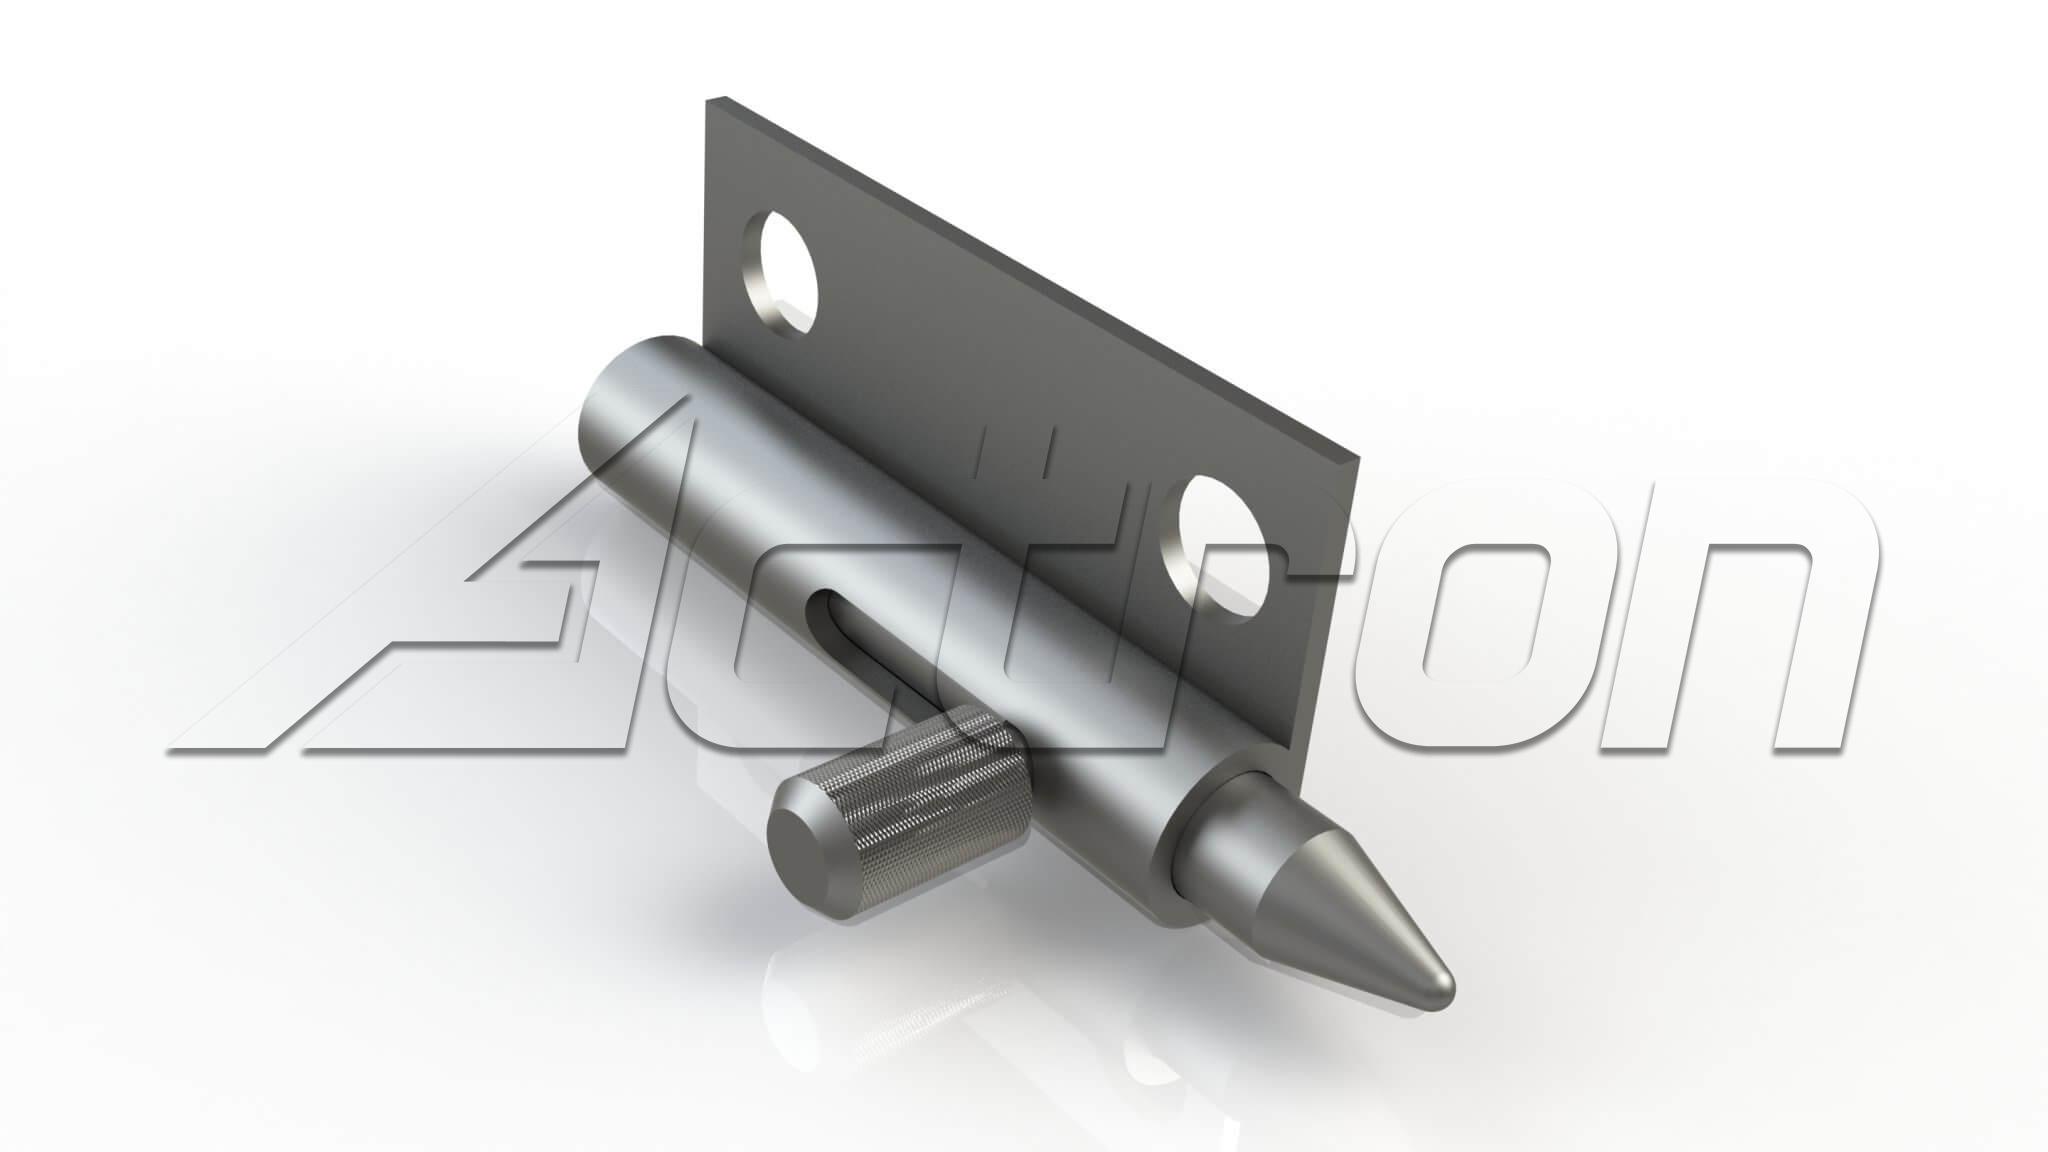 latch-8211-hinge-assy-5057-a2059.jpg